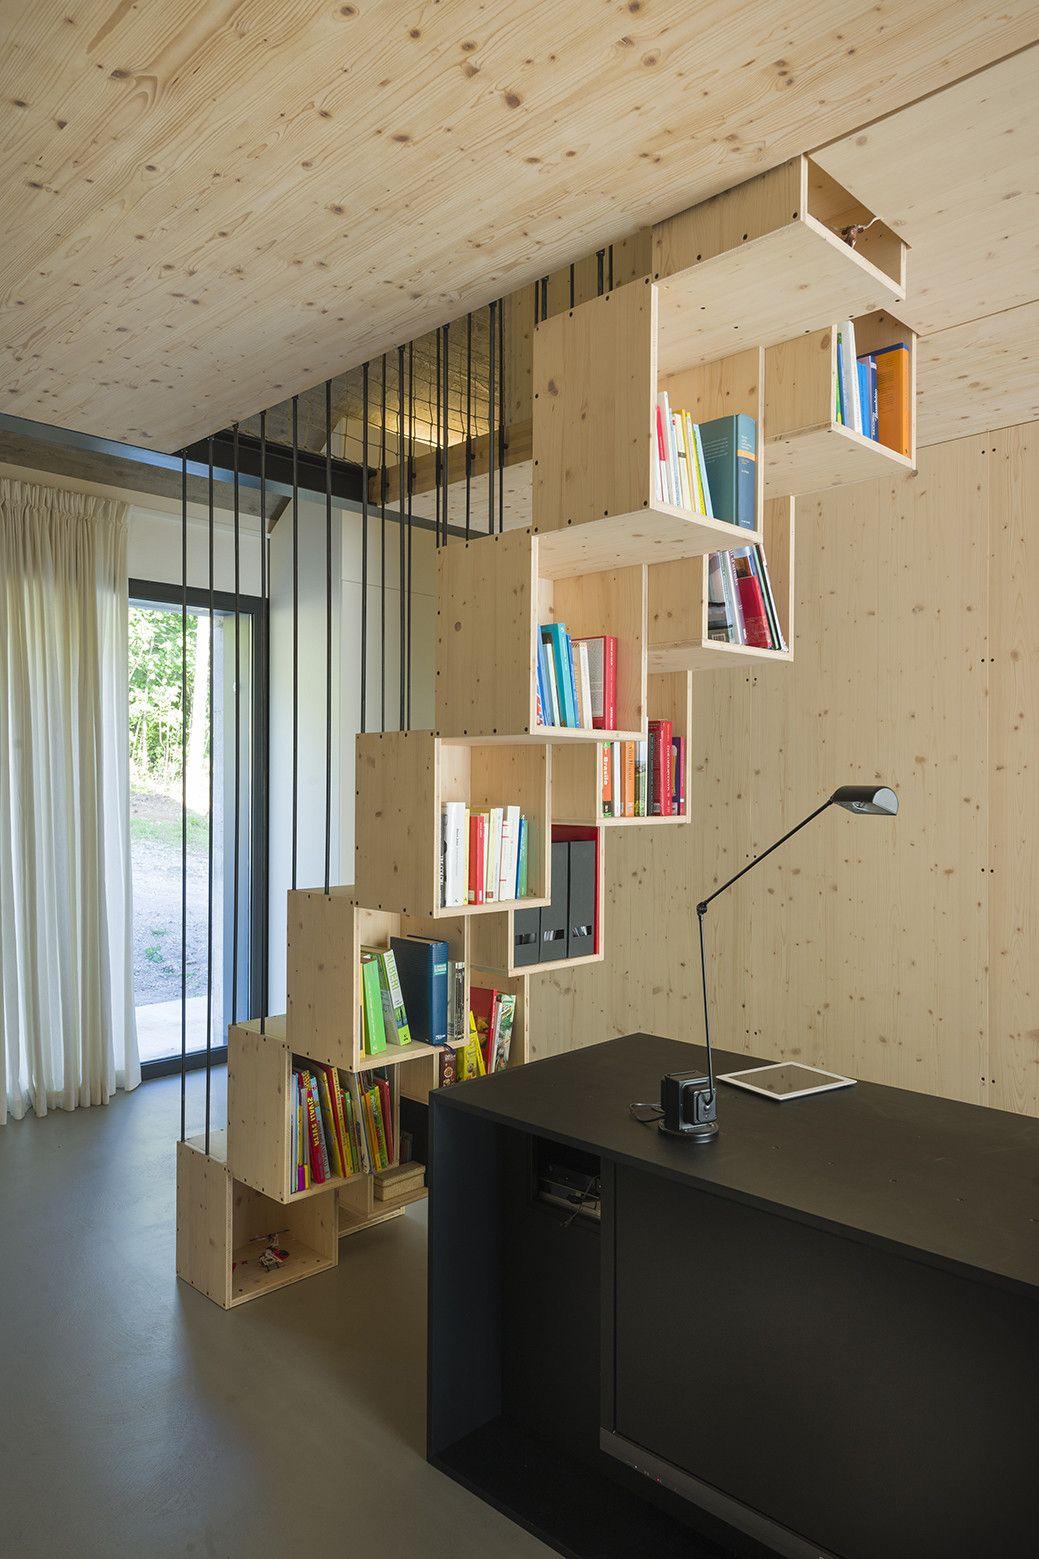 Galeria de Casa Compacta de Karst / dekleva gregorič arhitekti - 21